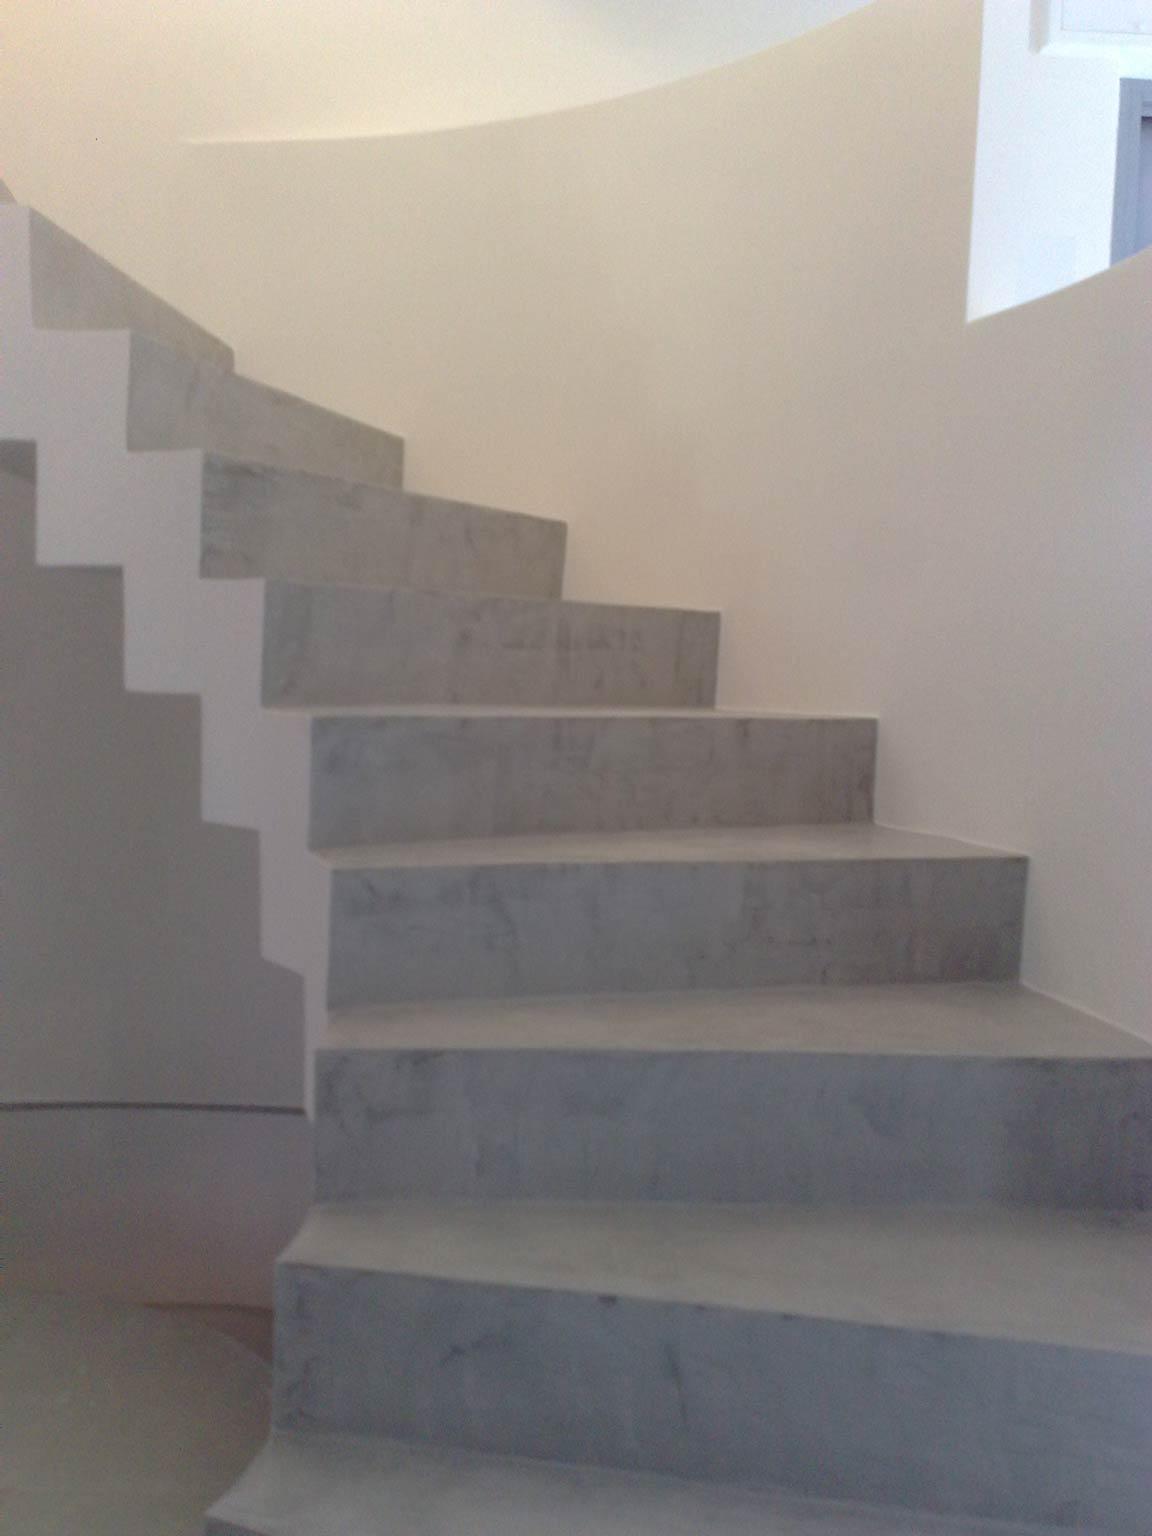 Resine per pavimenti interni pavimenti in resina per - Scale in resina prezzi ...